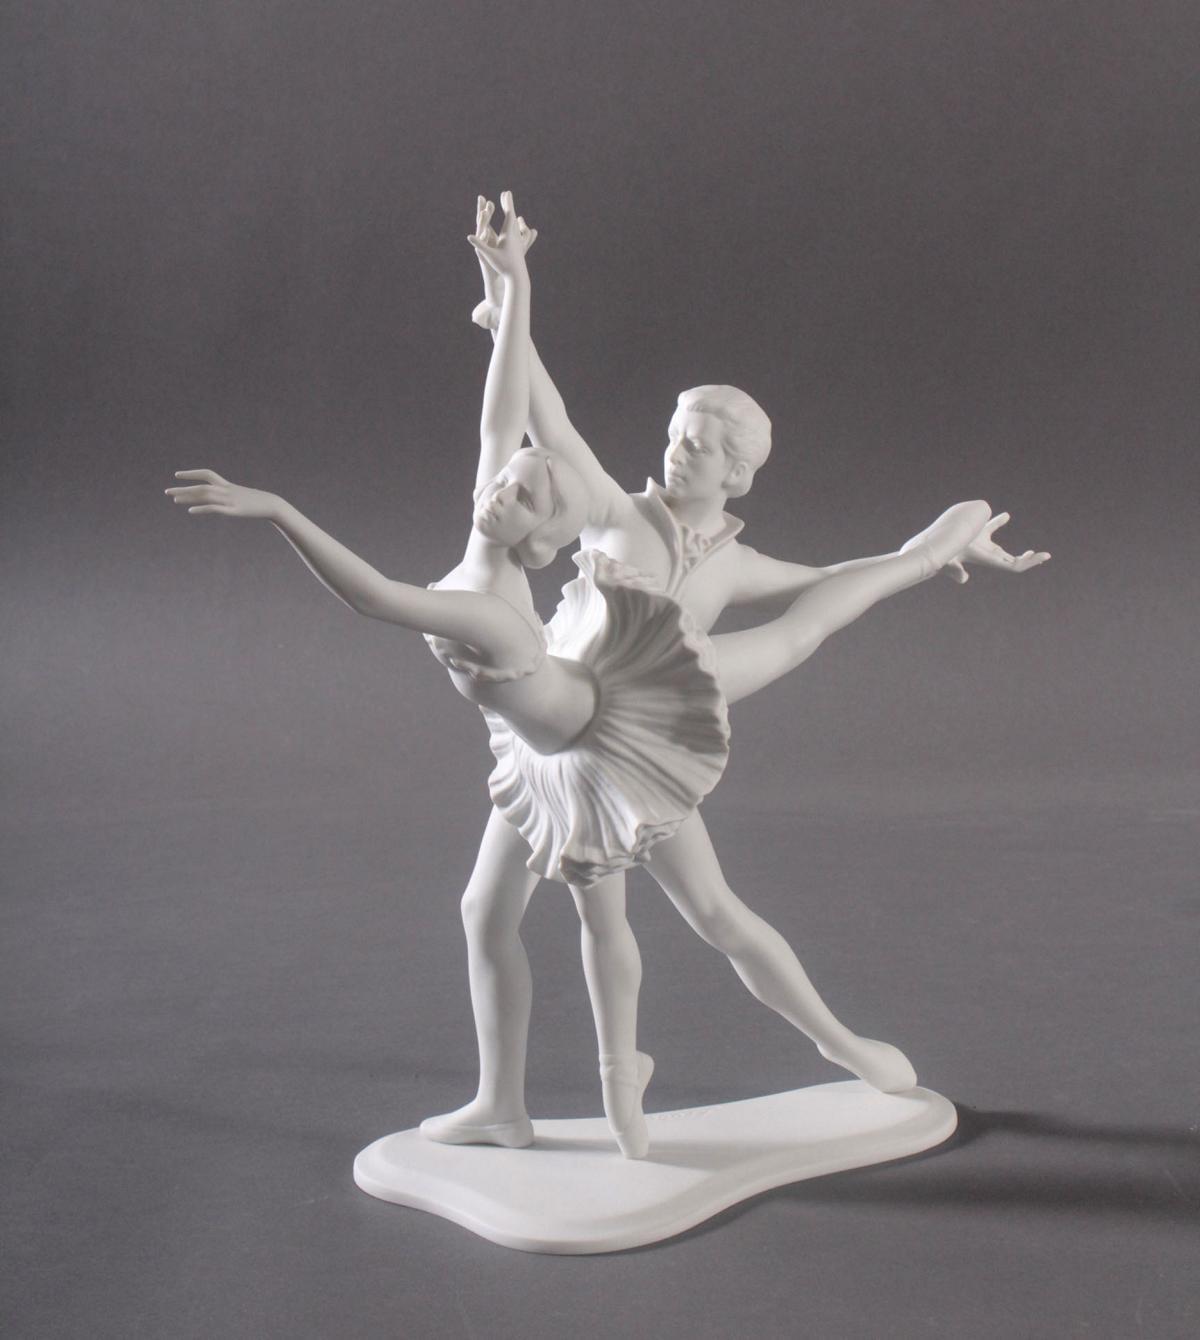 Goebel-Figur, 'Tanzendes Paar', 20. Jahrhundert